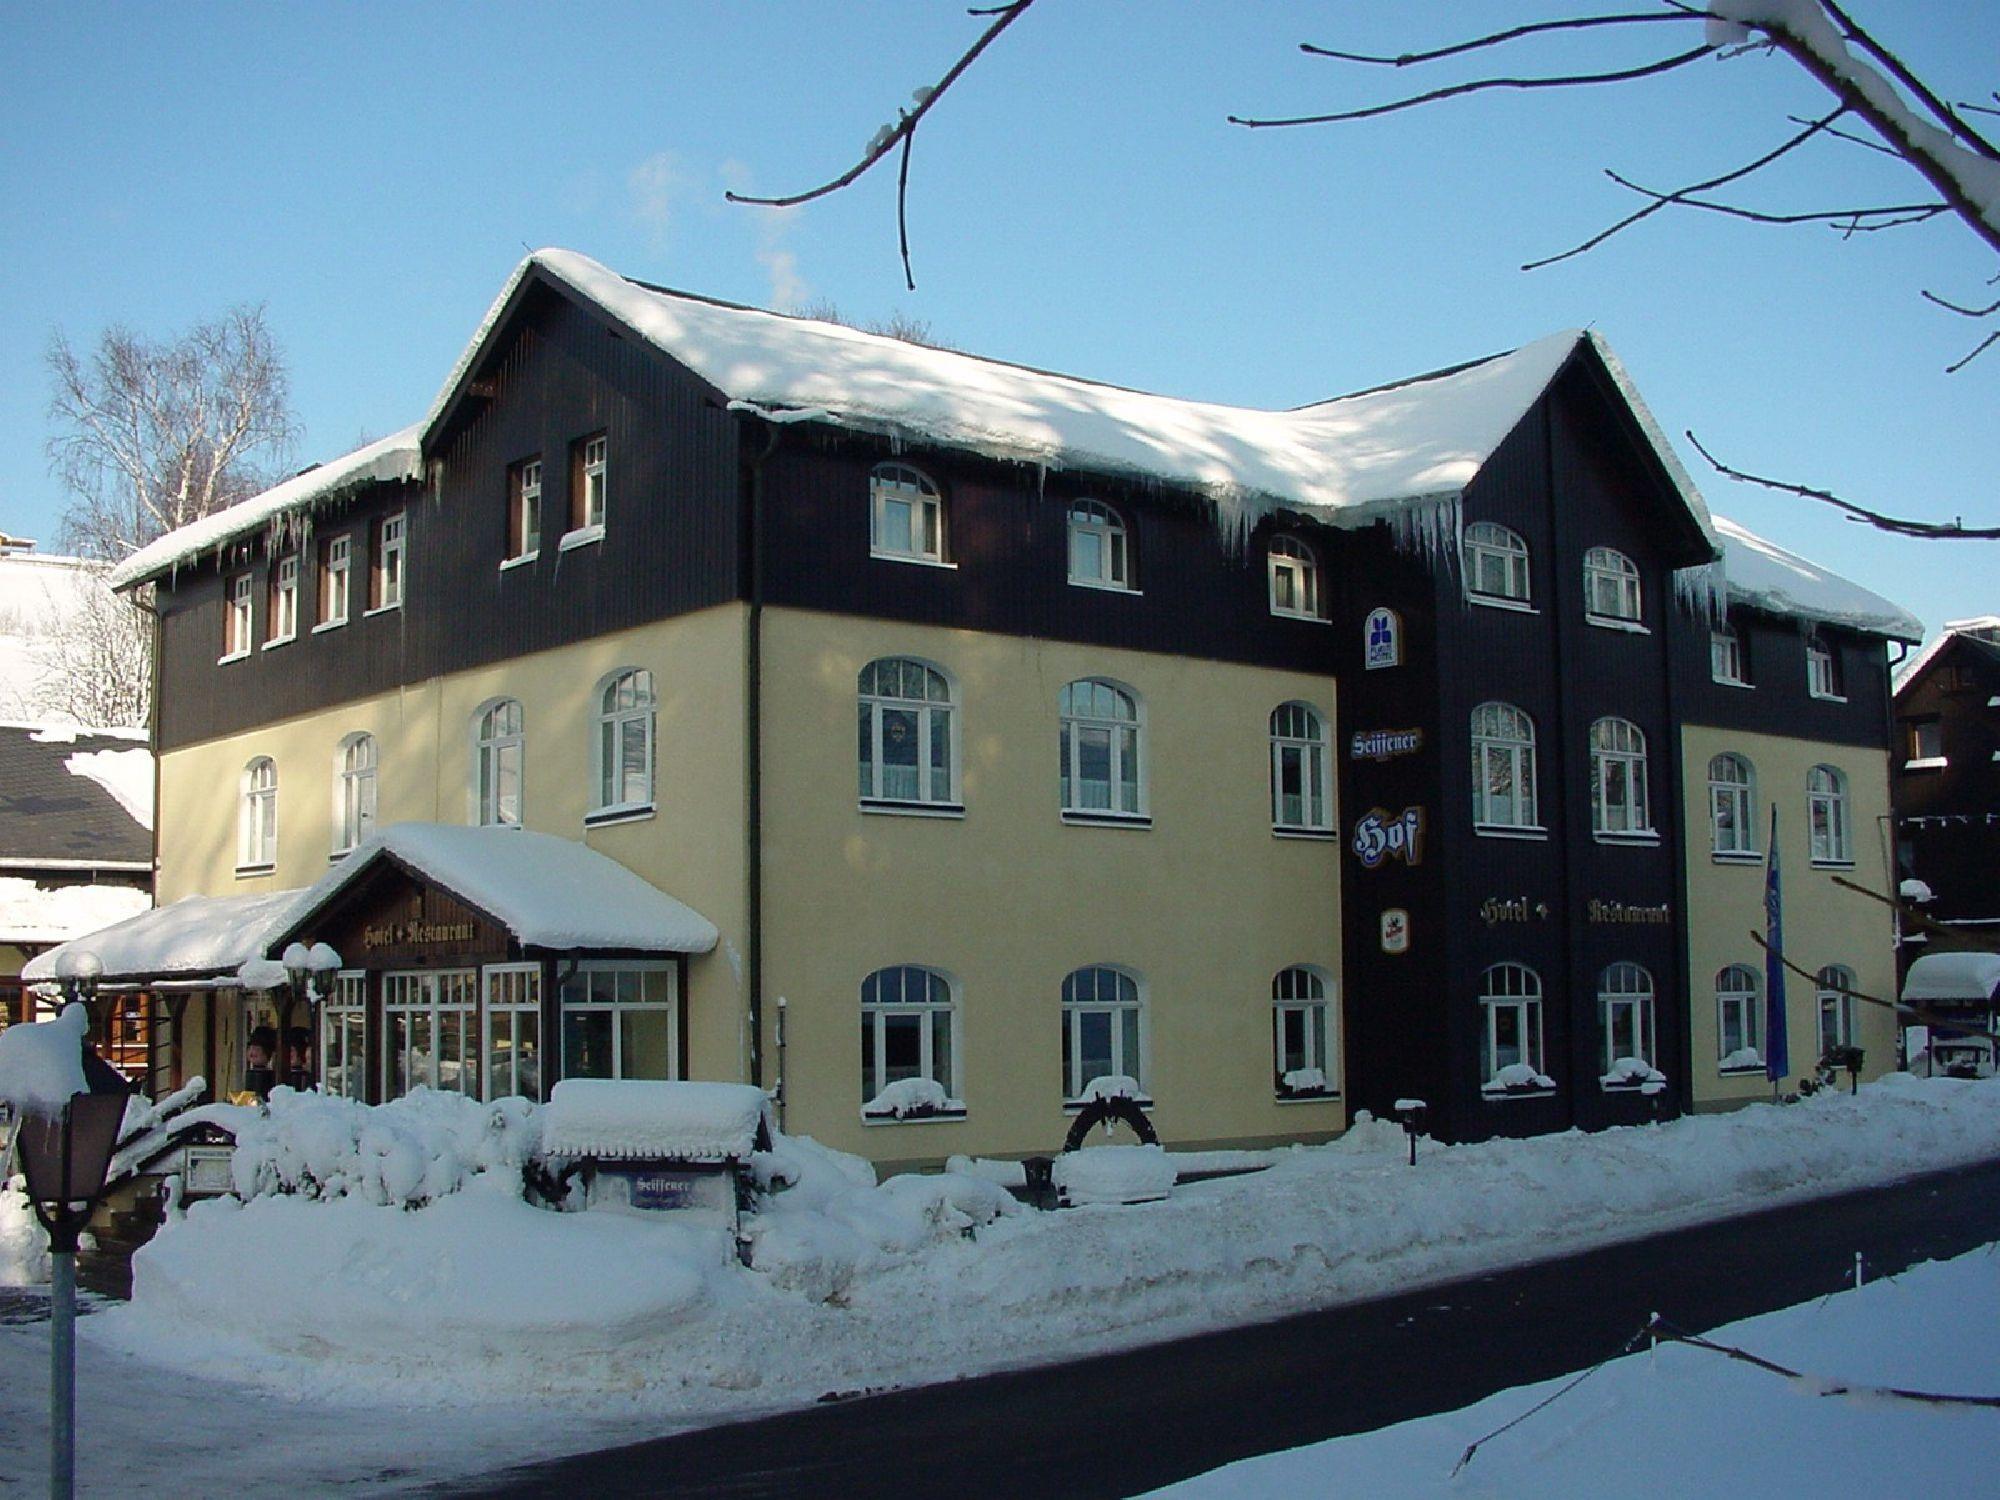 Pauschalangebote der Erzgebirgischen Hotels